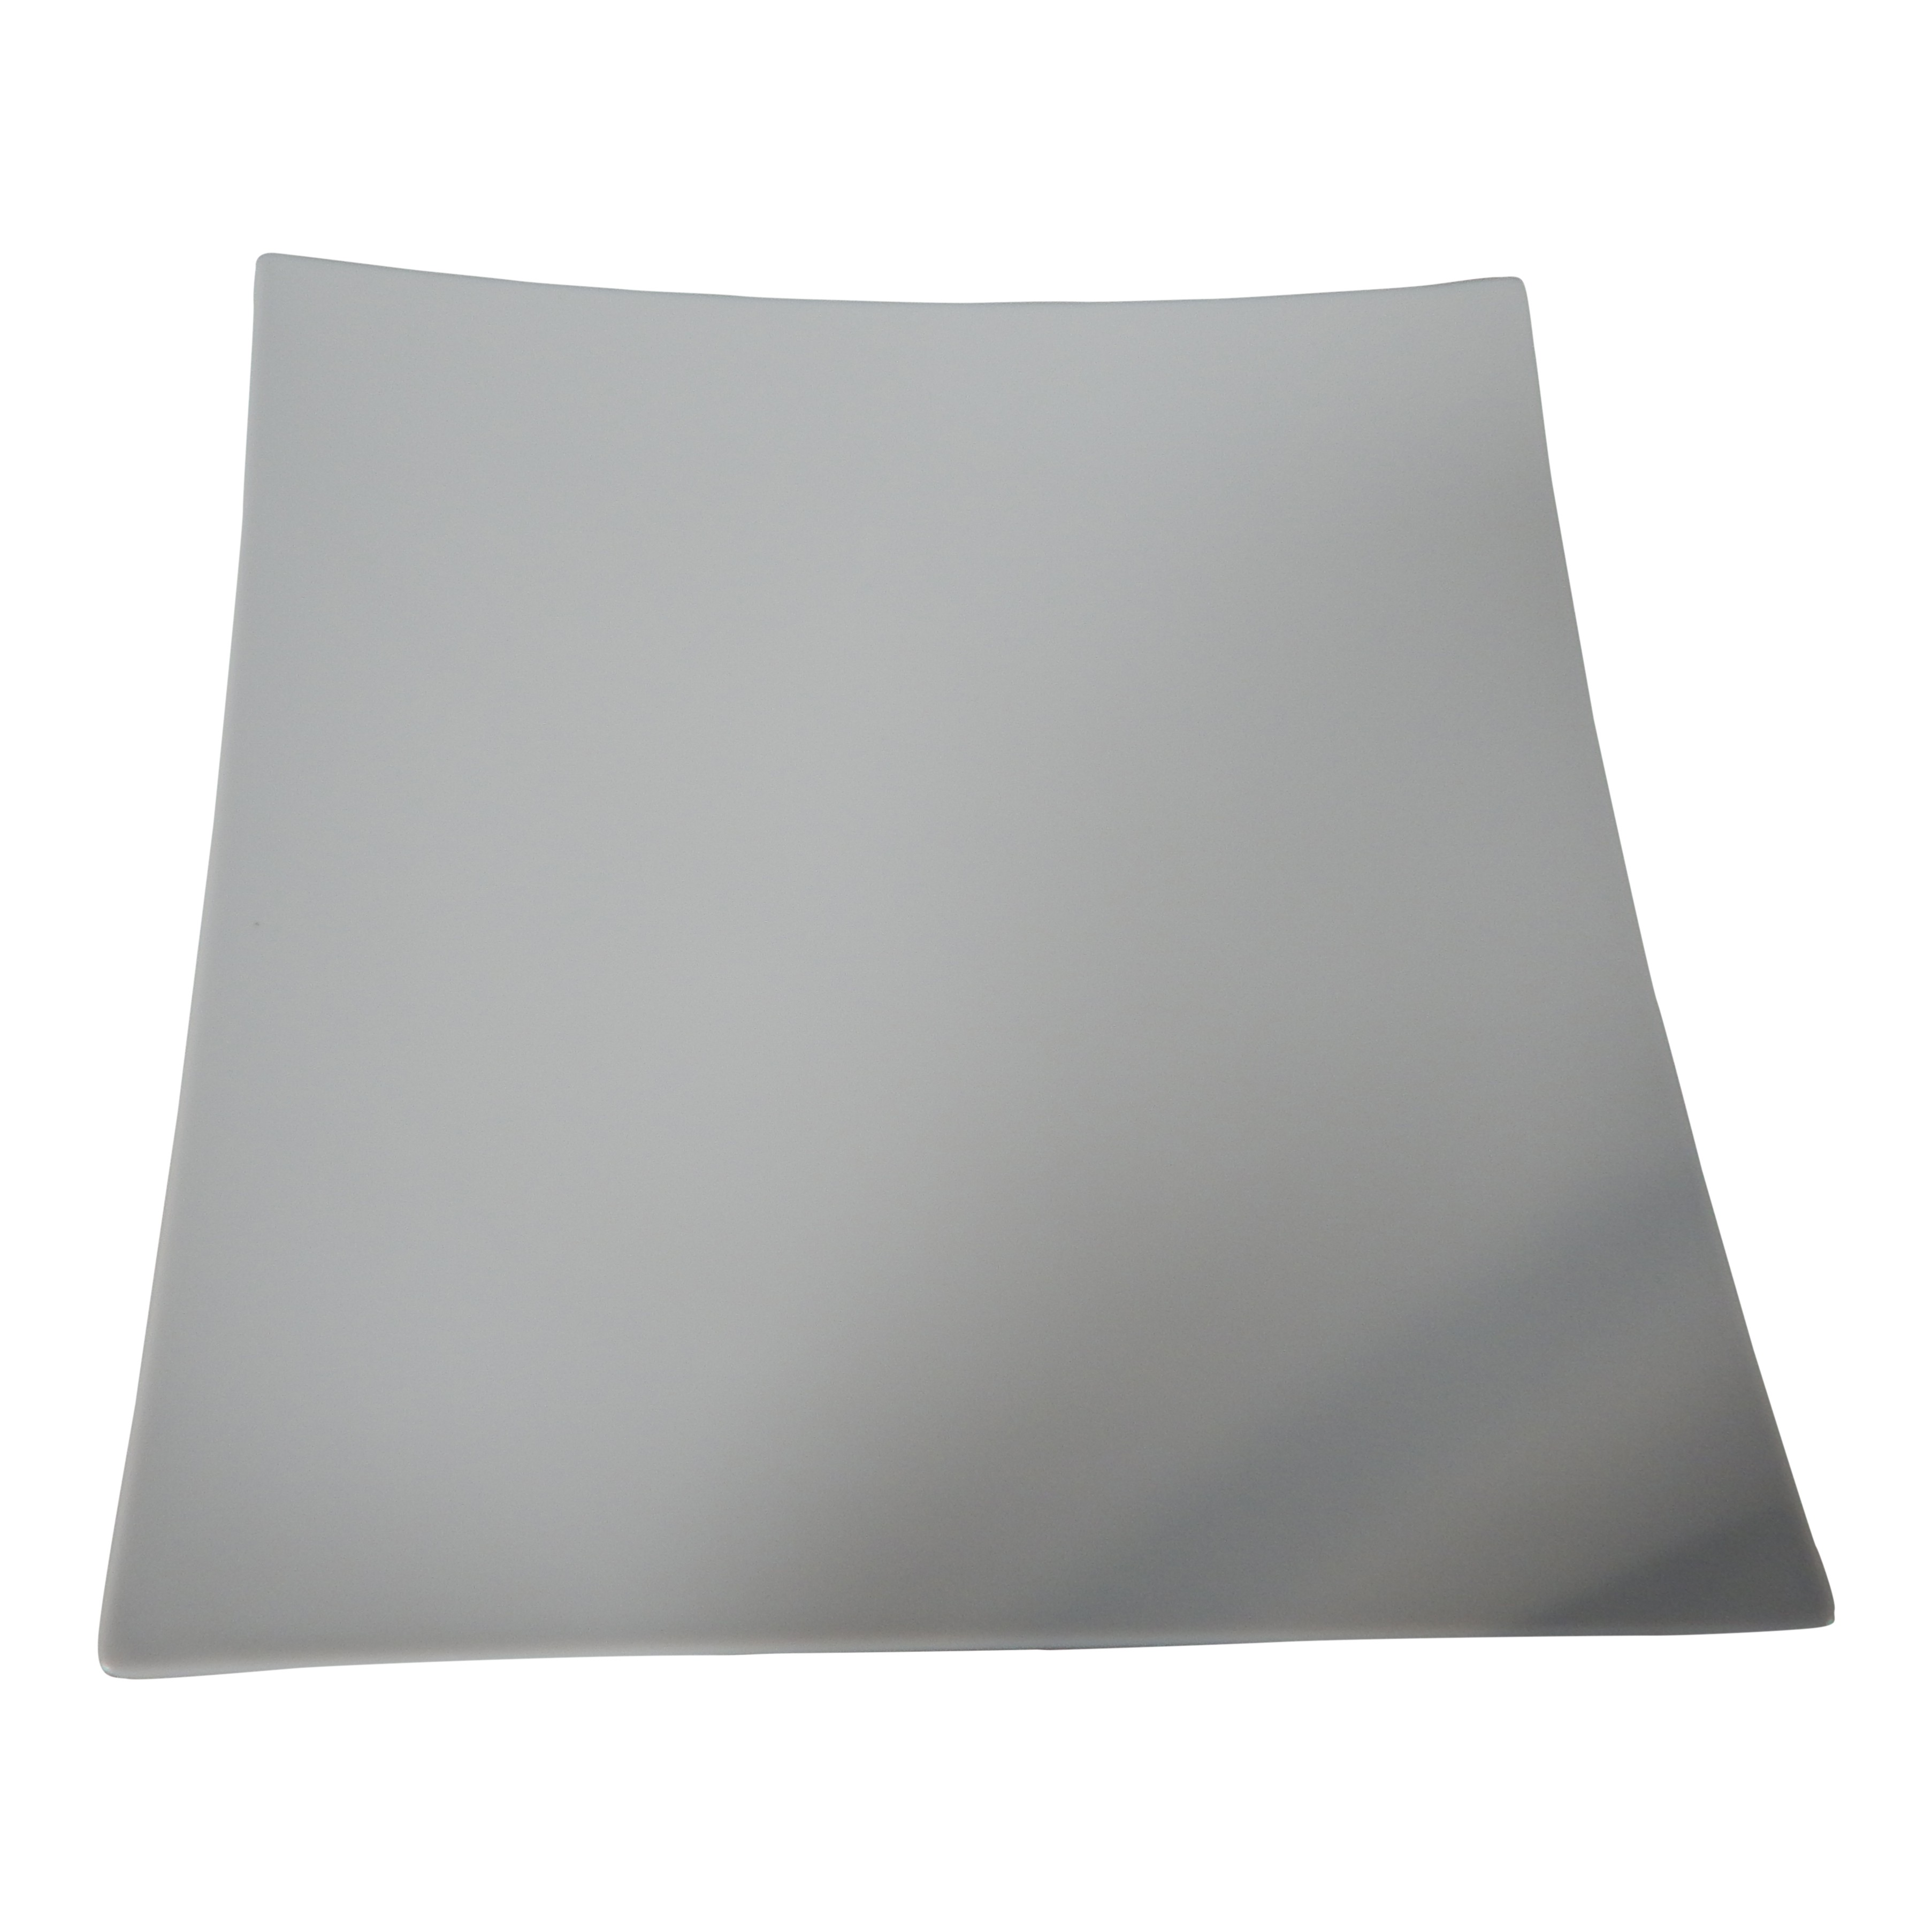 Gebogen vierkant bord wit 31x31cm